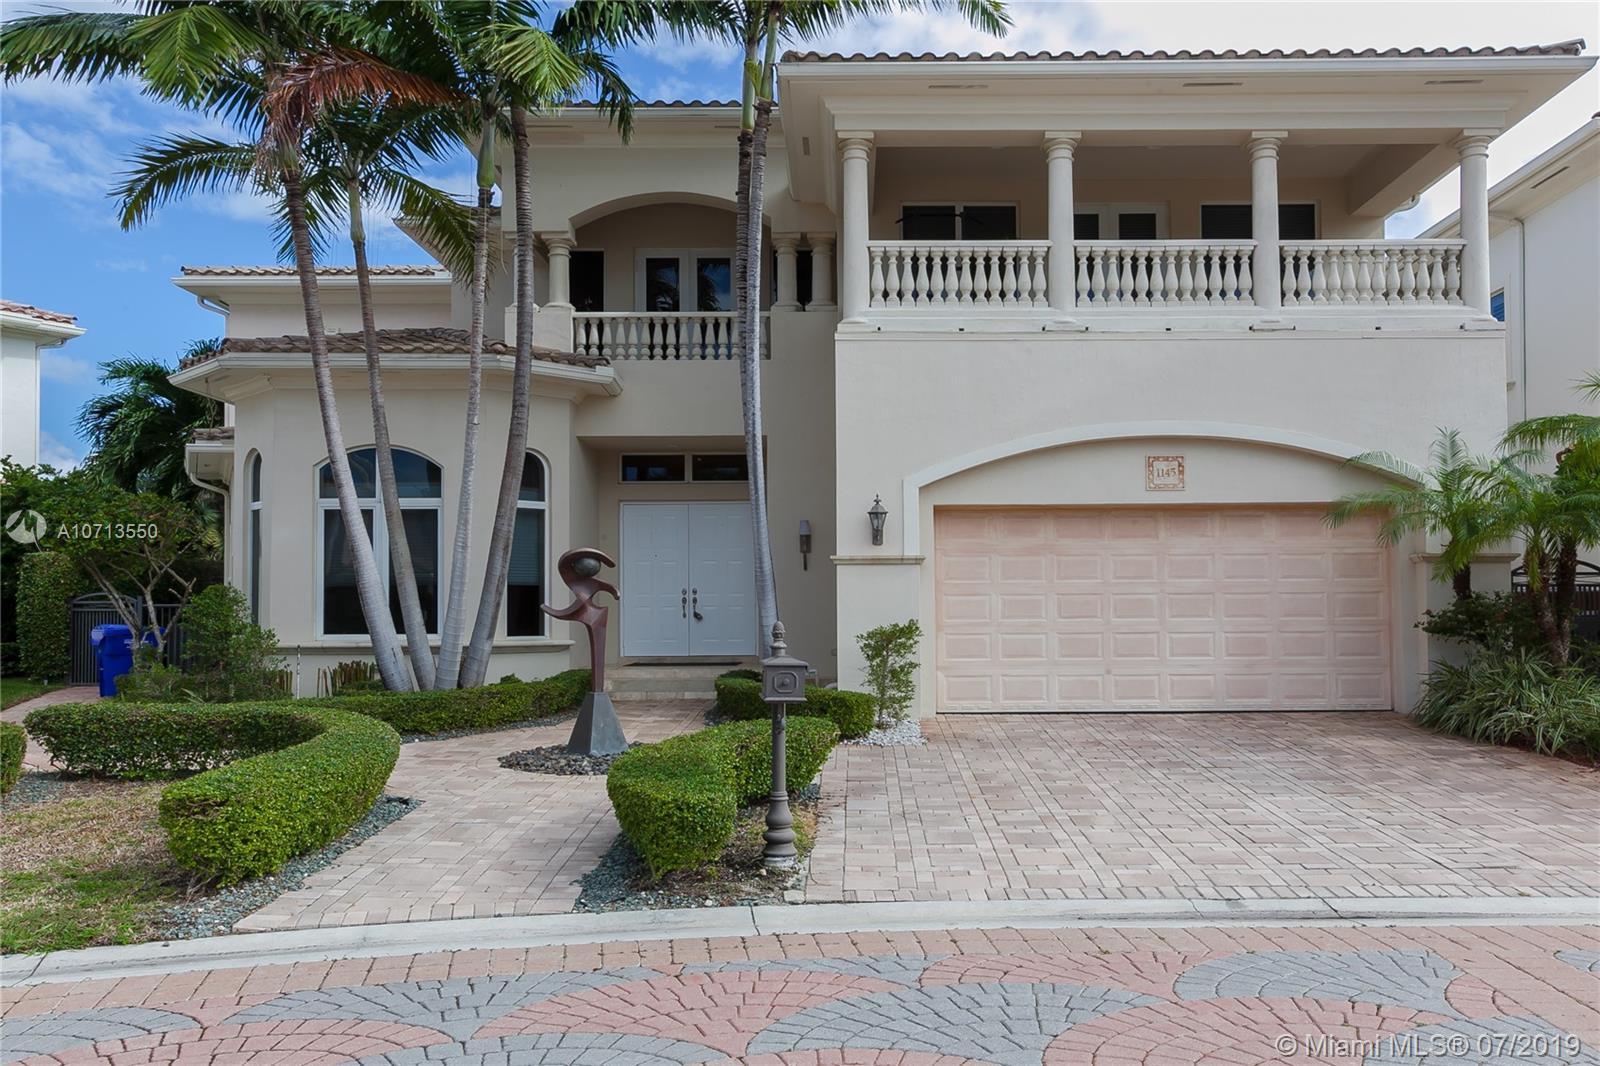 1145  Hatteras LN  For Sale A10713550, FL